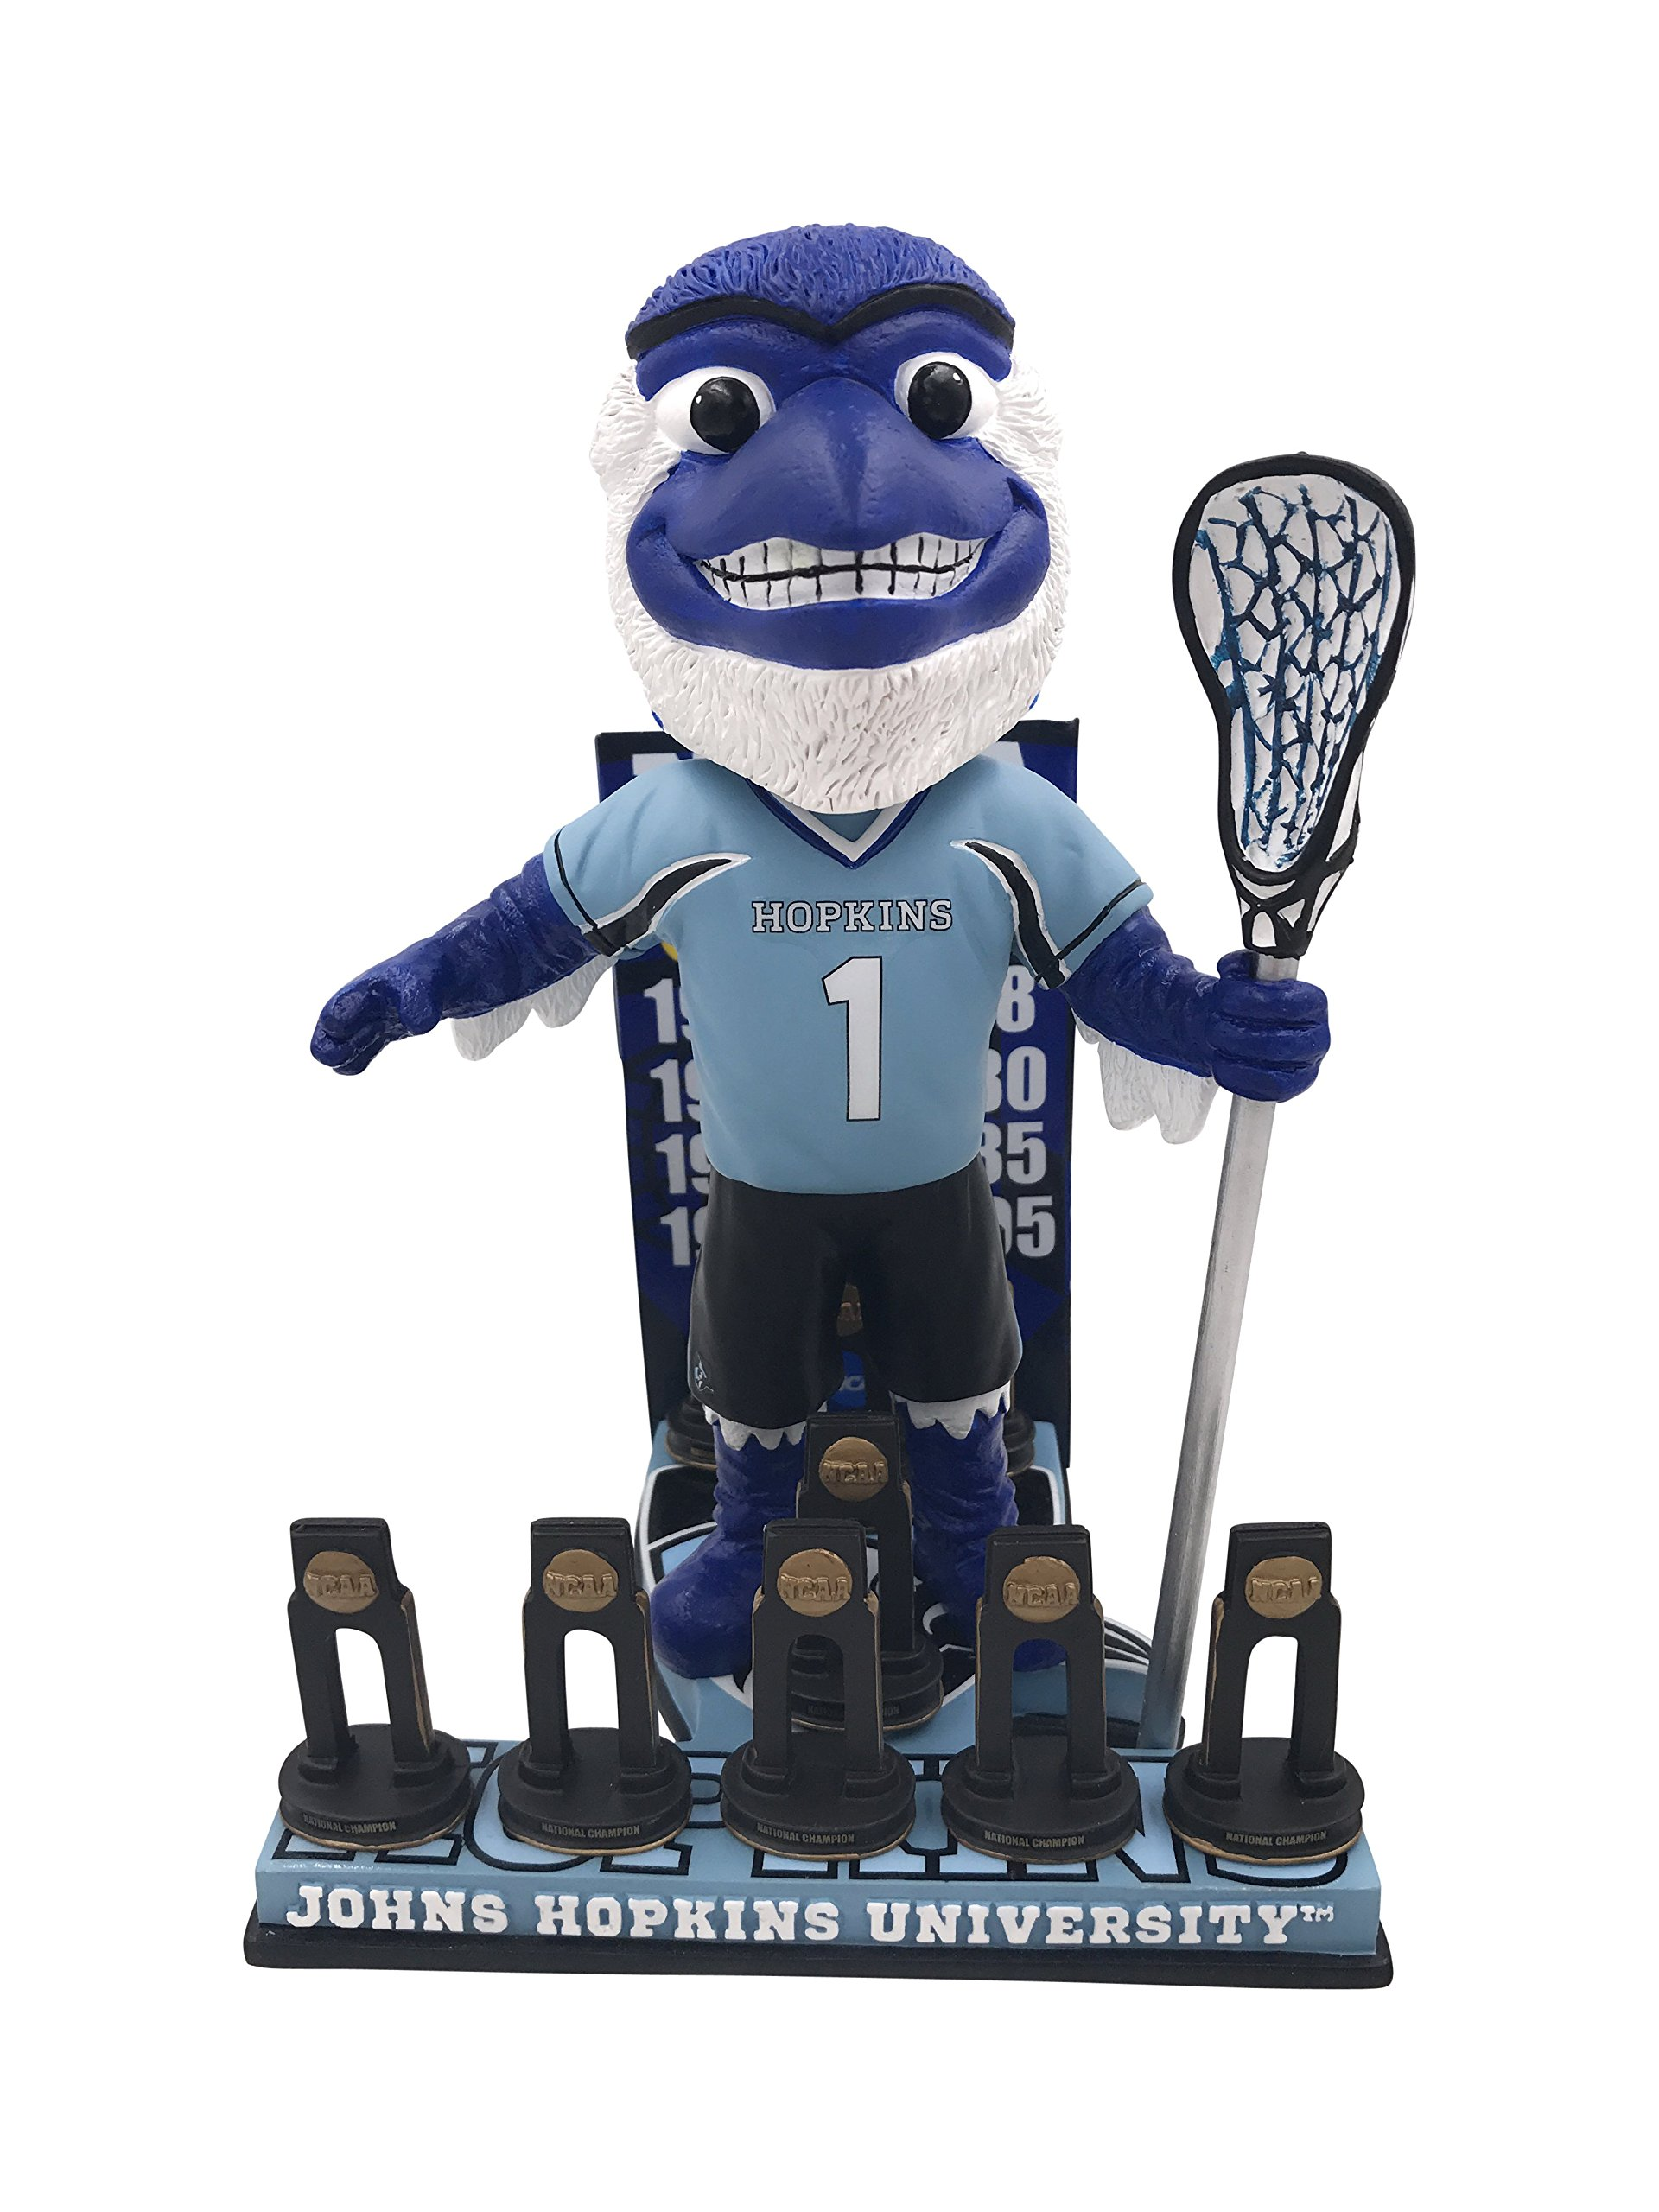 Blue Jay Johns Hopkins University Men's Lacrosse National Champions Bobblehead